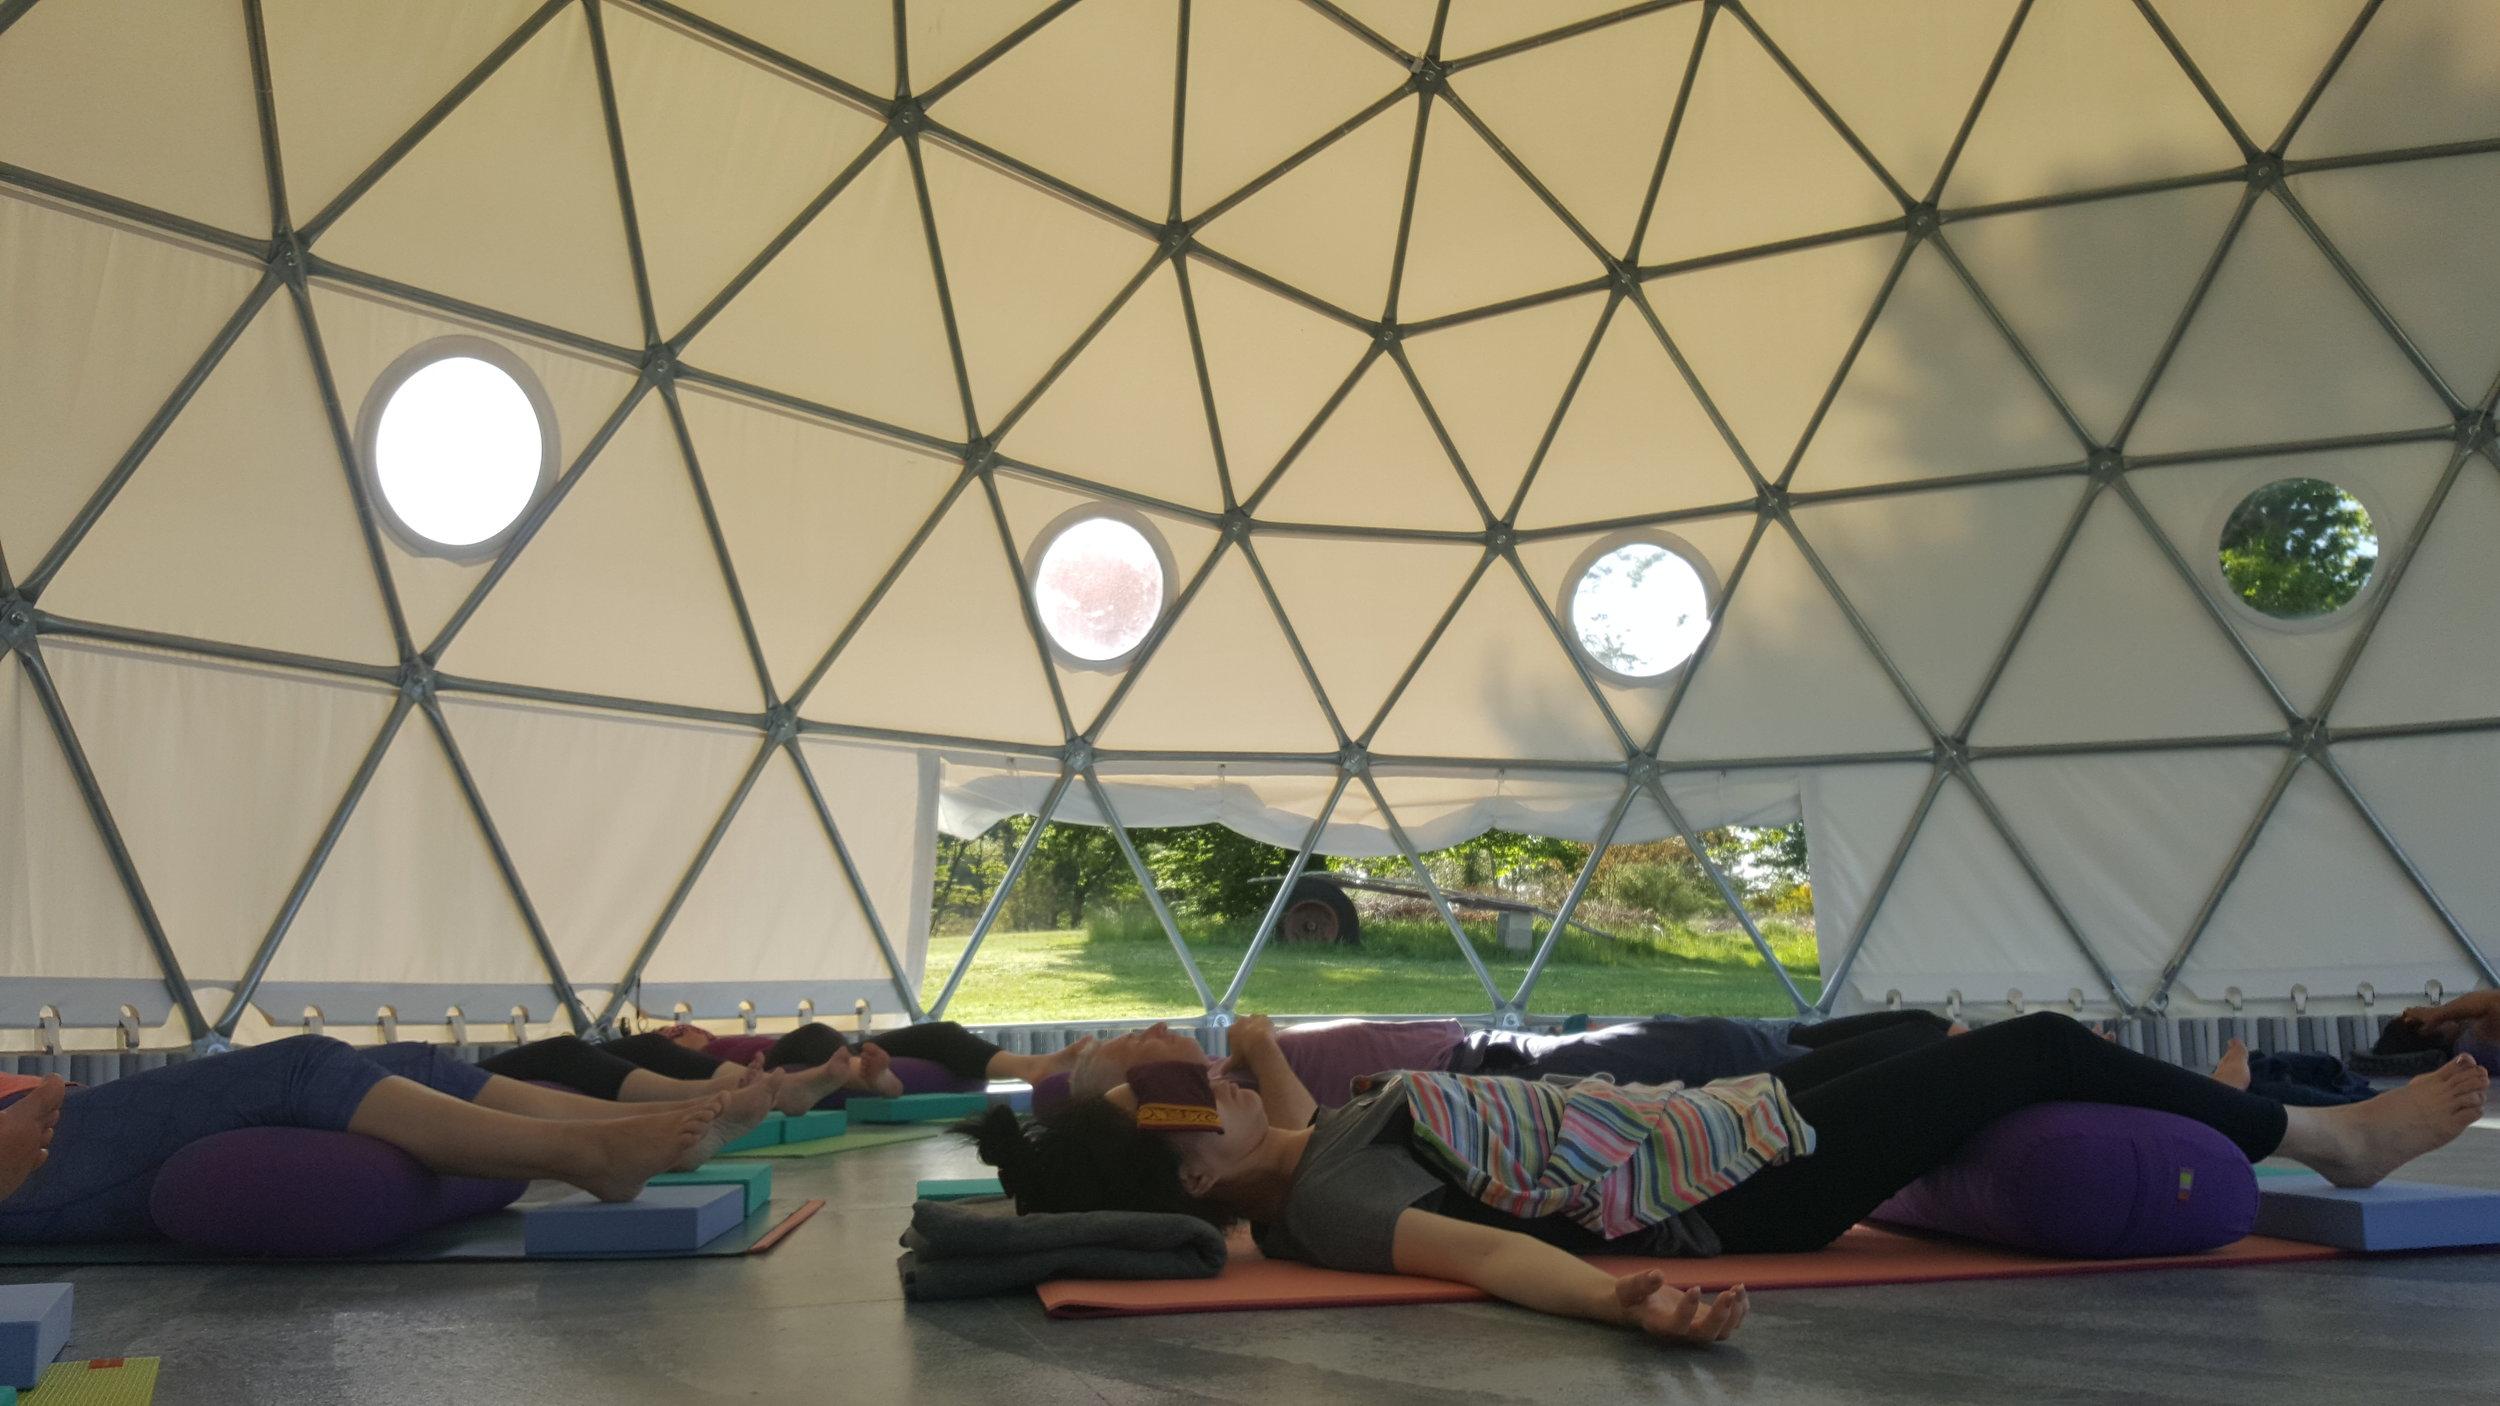 Yoga Retreat FRance 22 b.jpg